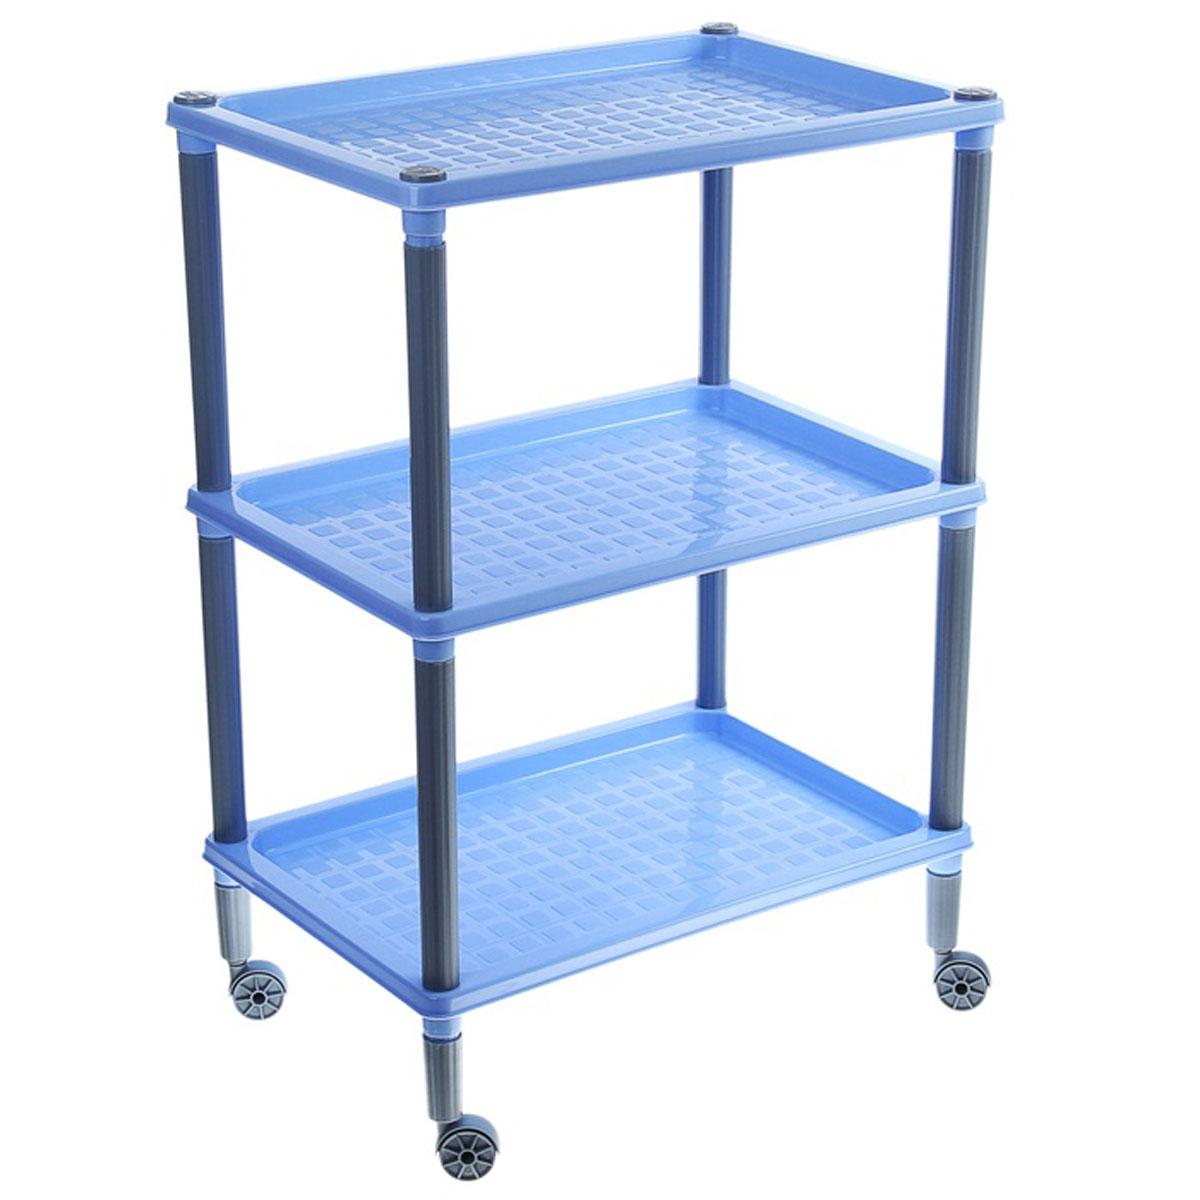 "Этажерка ""Флавия"", 3 полки, на колесиках, цвет: синий, 42 х 29 х 61 см, Бытпласт"